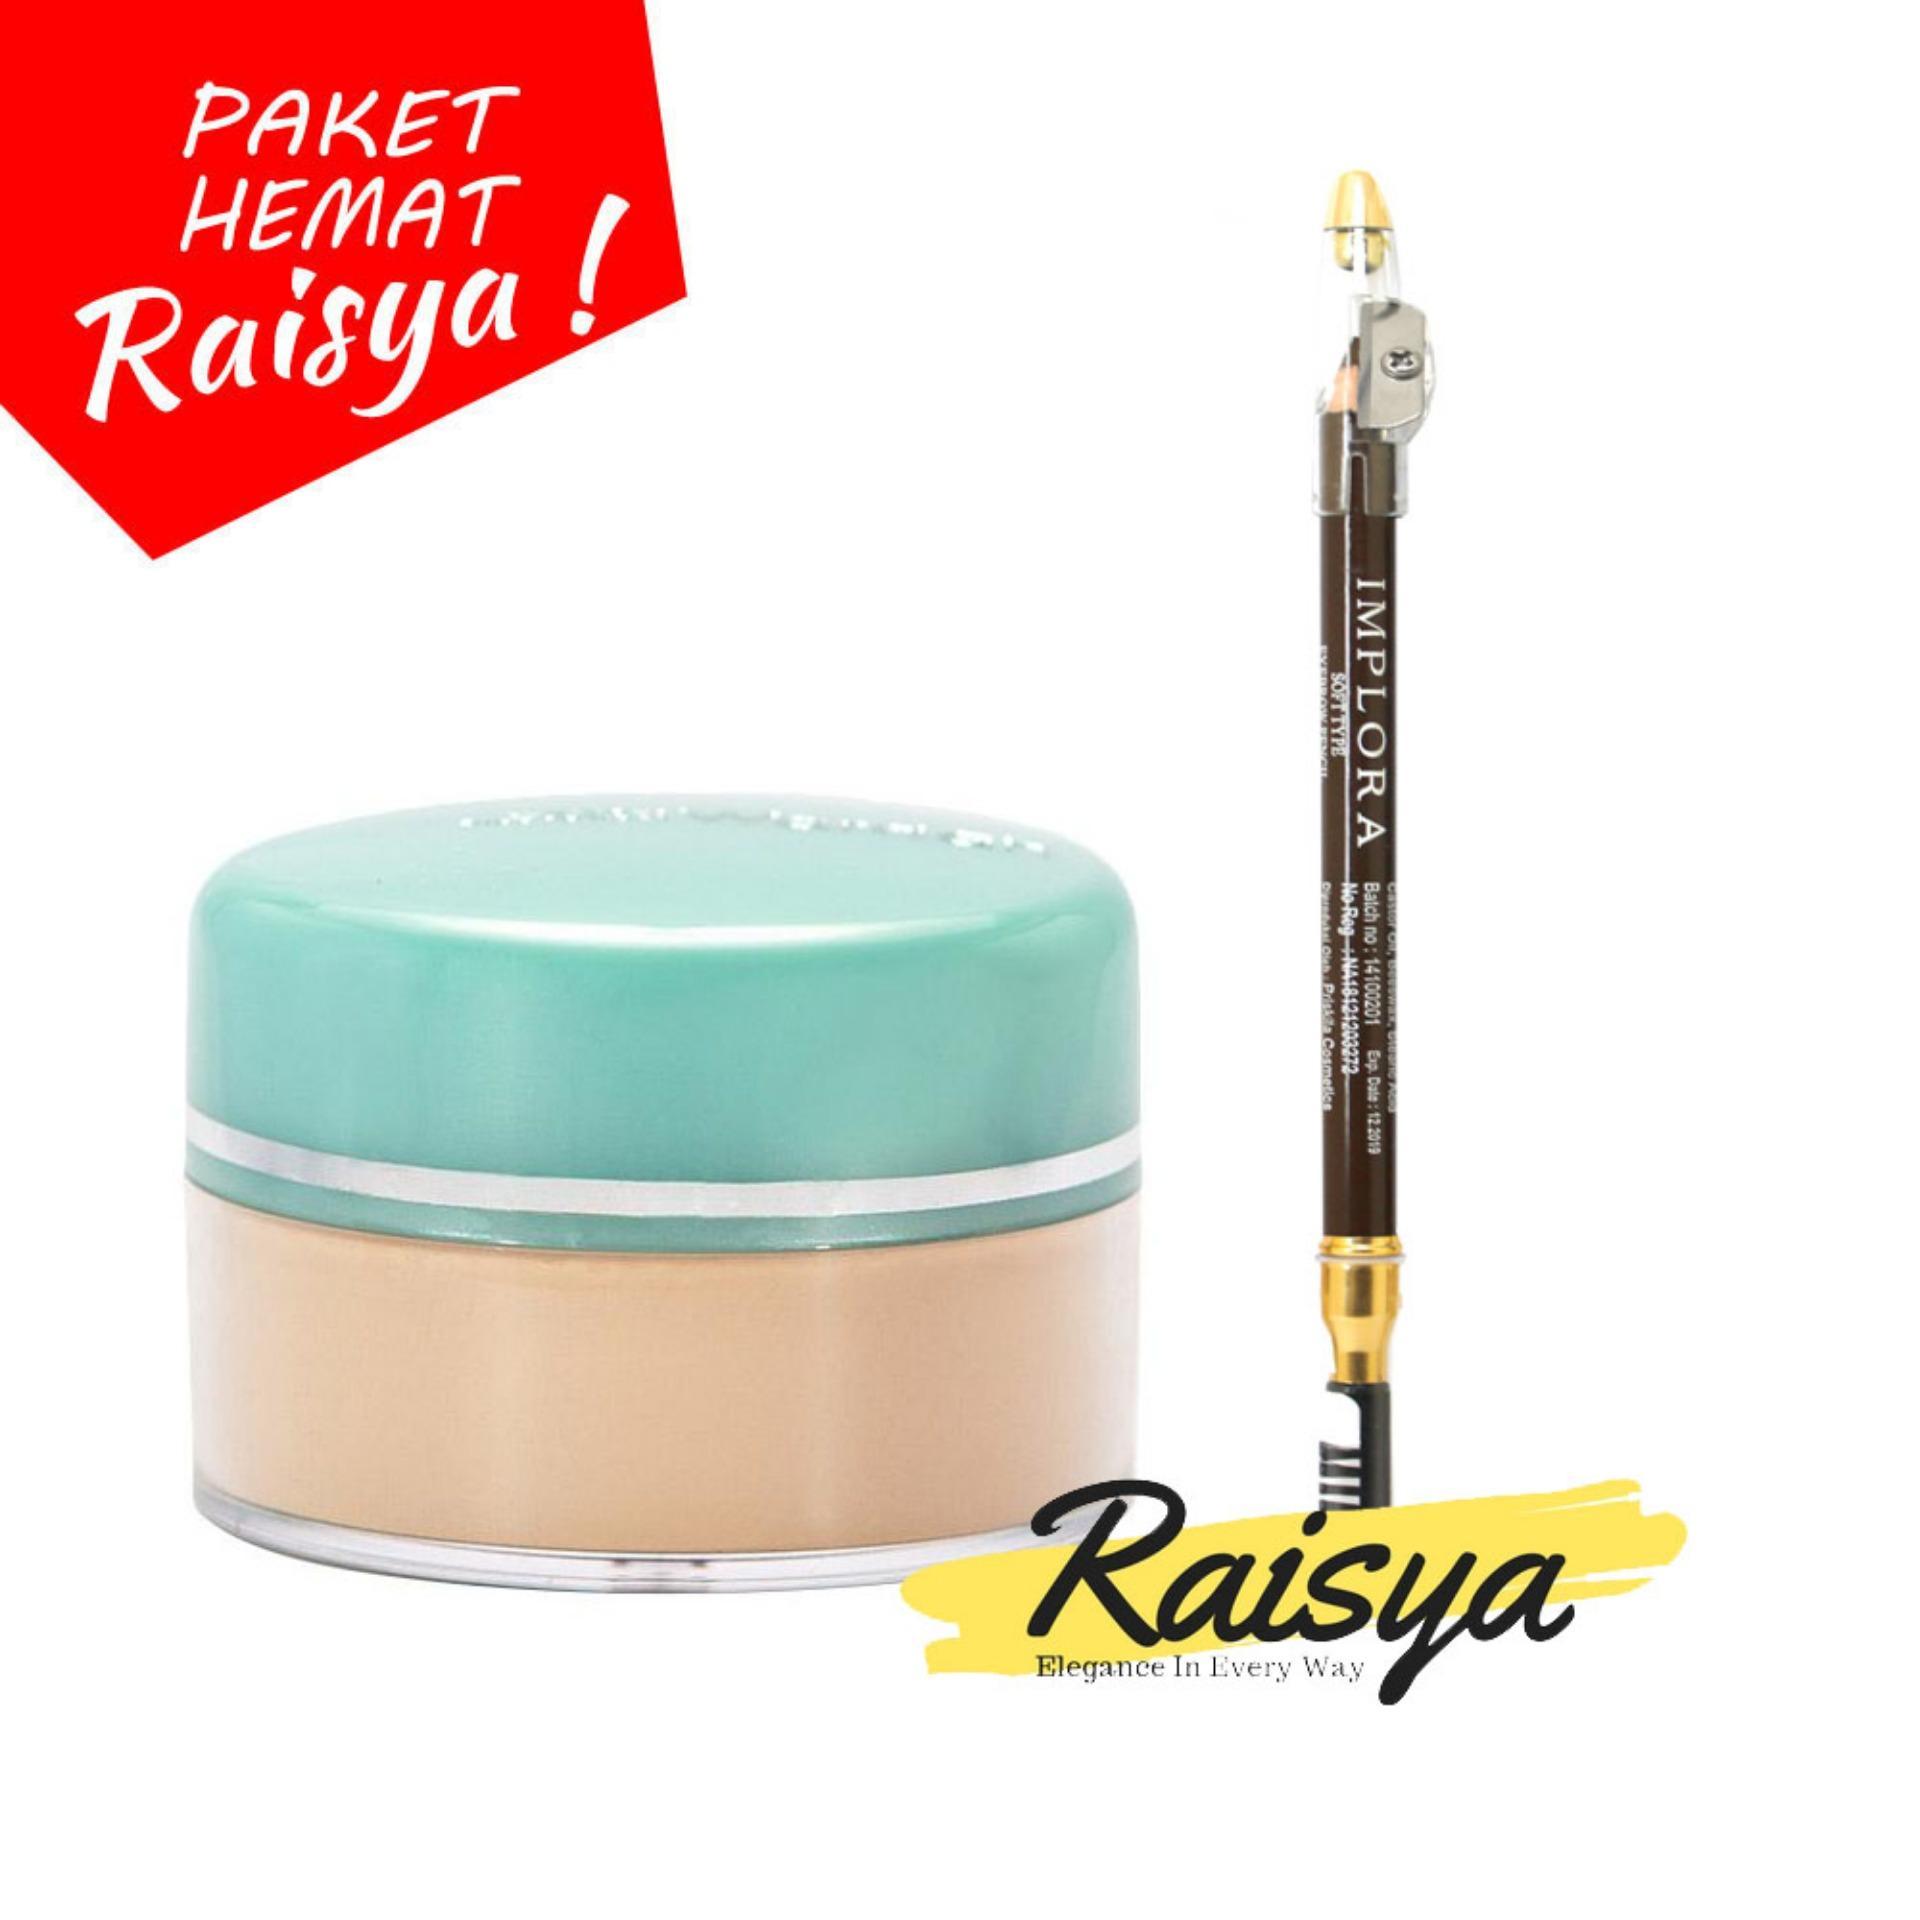 Wardah Everyday Luminous Face Powder - Bedak Tabur - 02 Beige Free Implora Pensil Alis Coklat Resmi BPOM